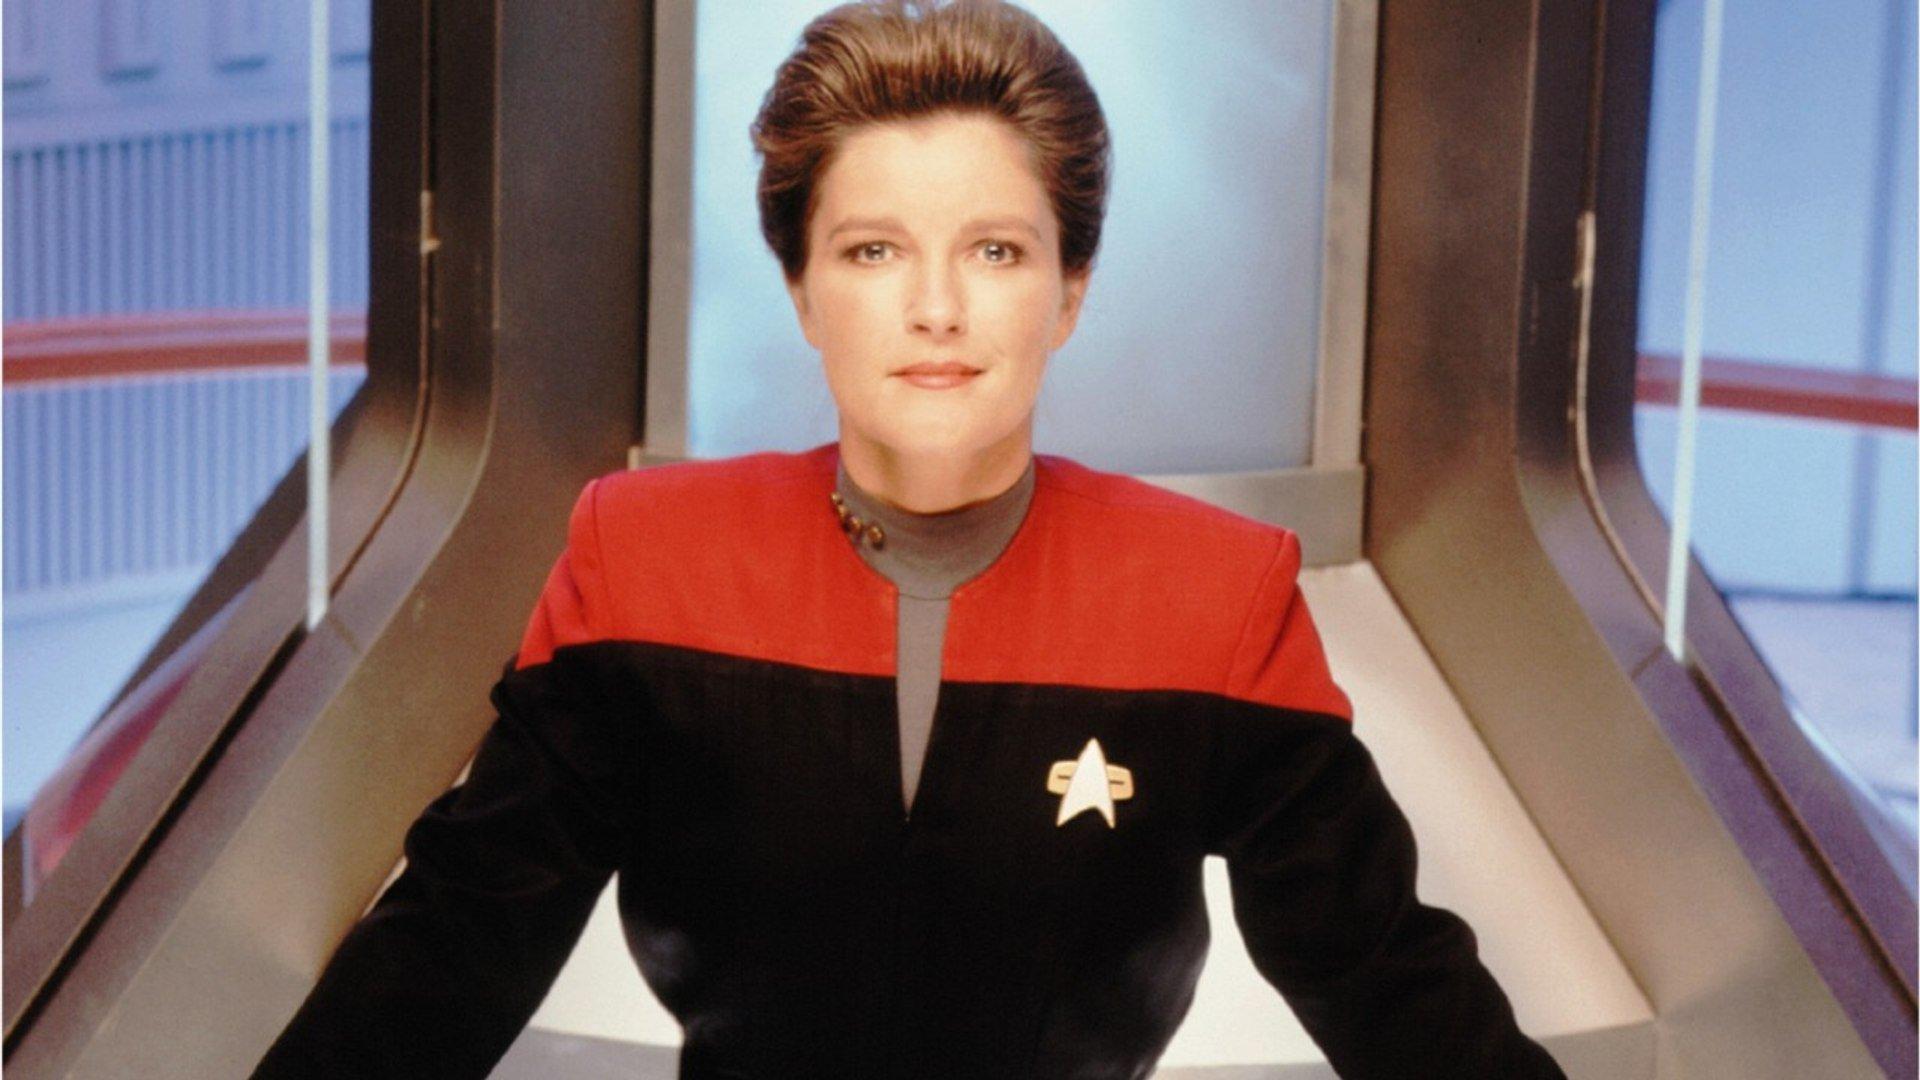 Kate Mulgrew Returns As Janeway For A New Star Trek Show